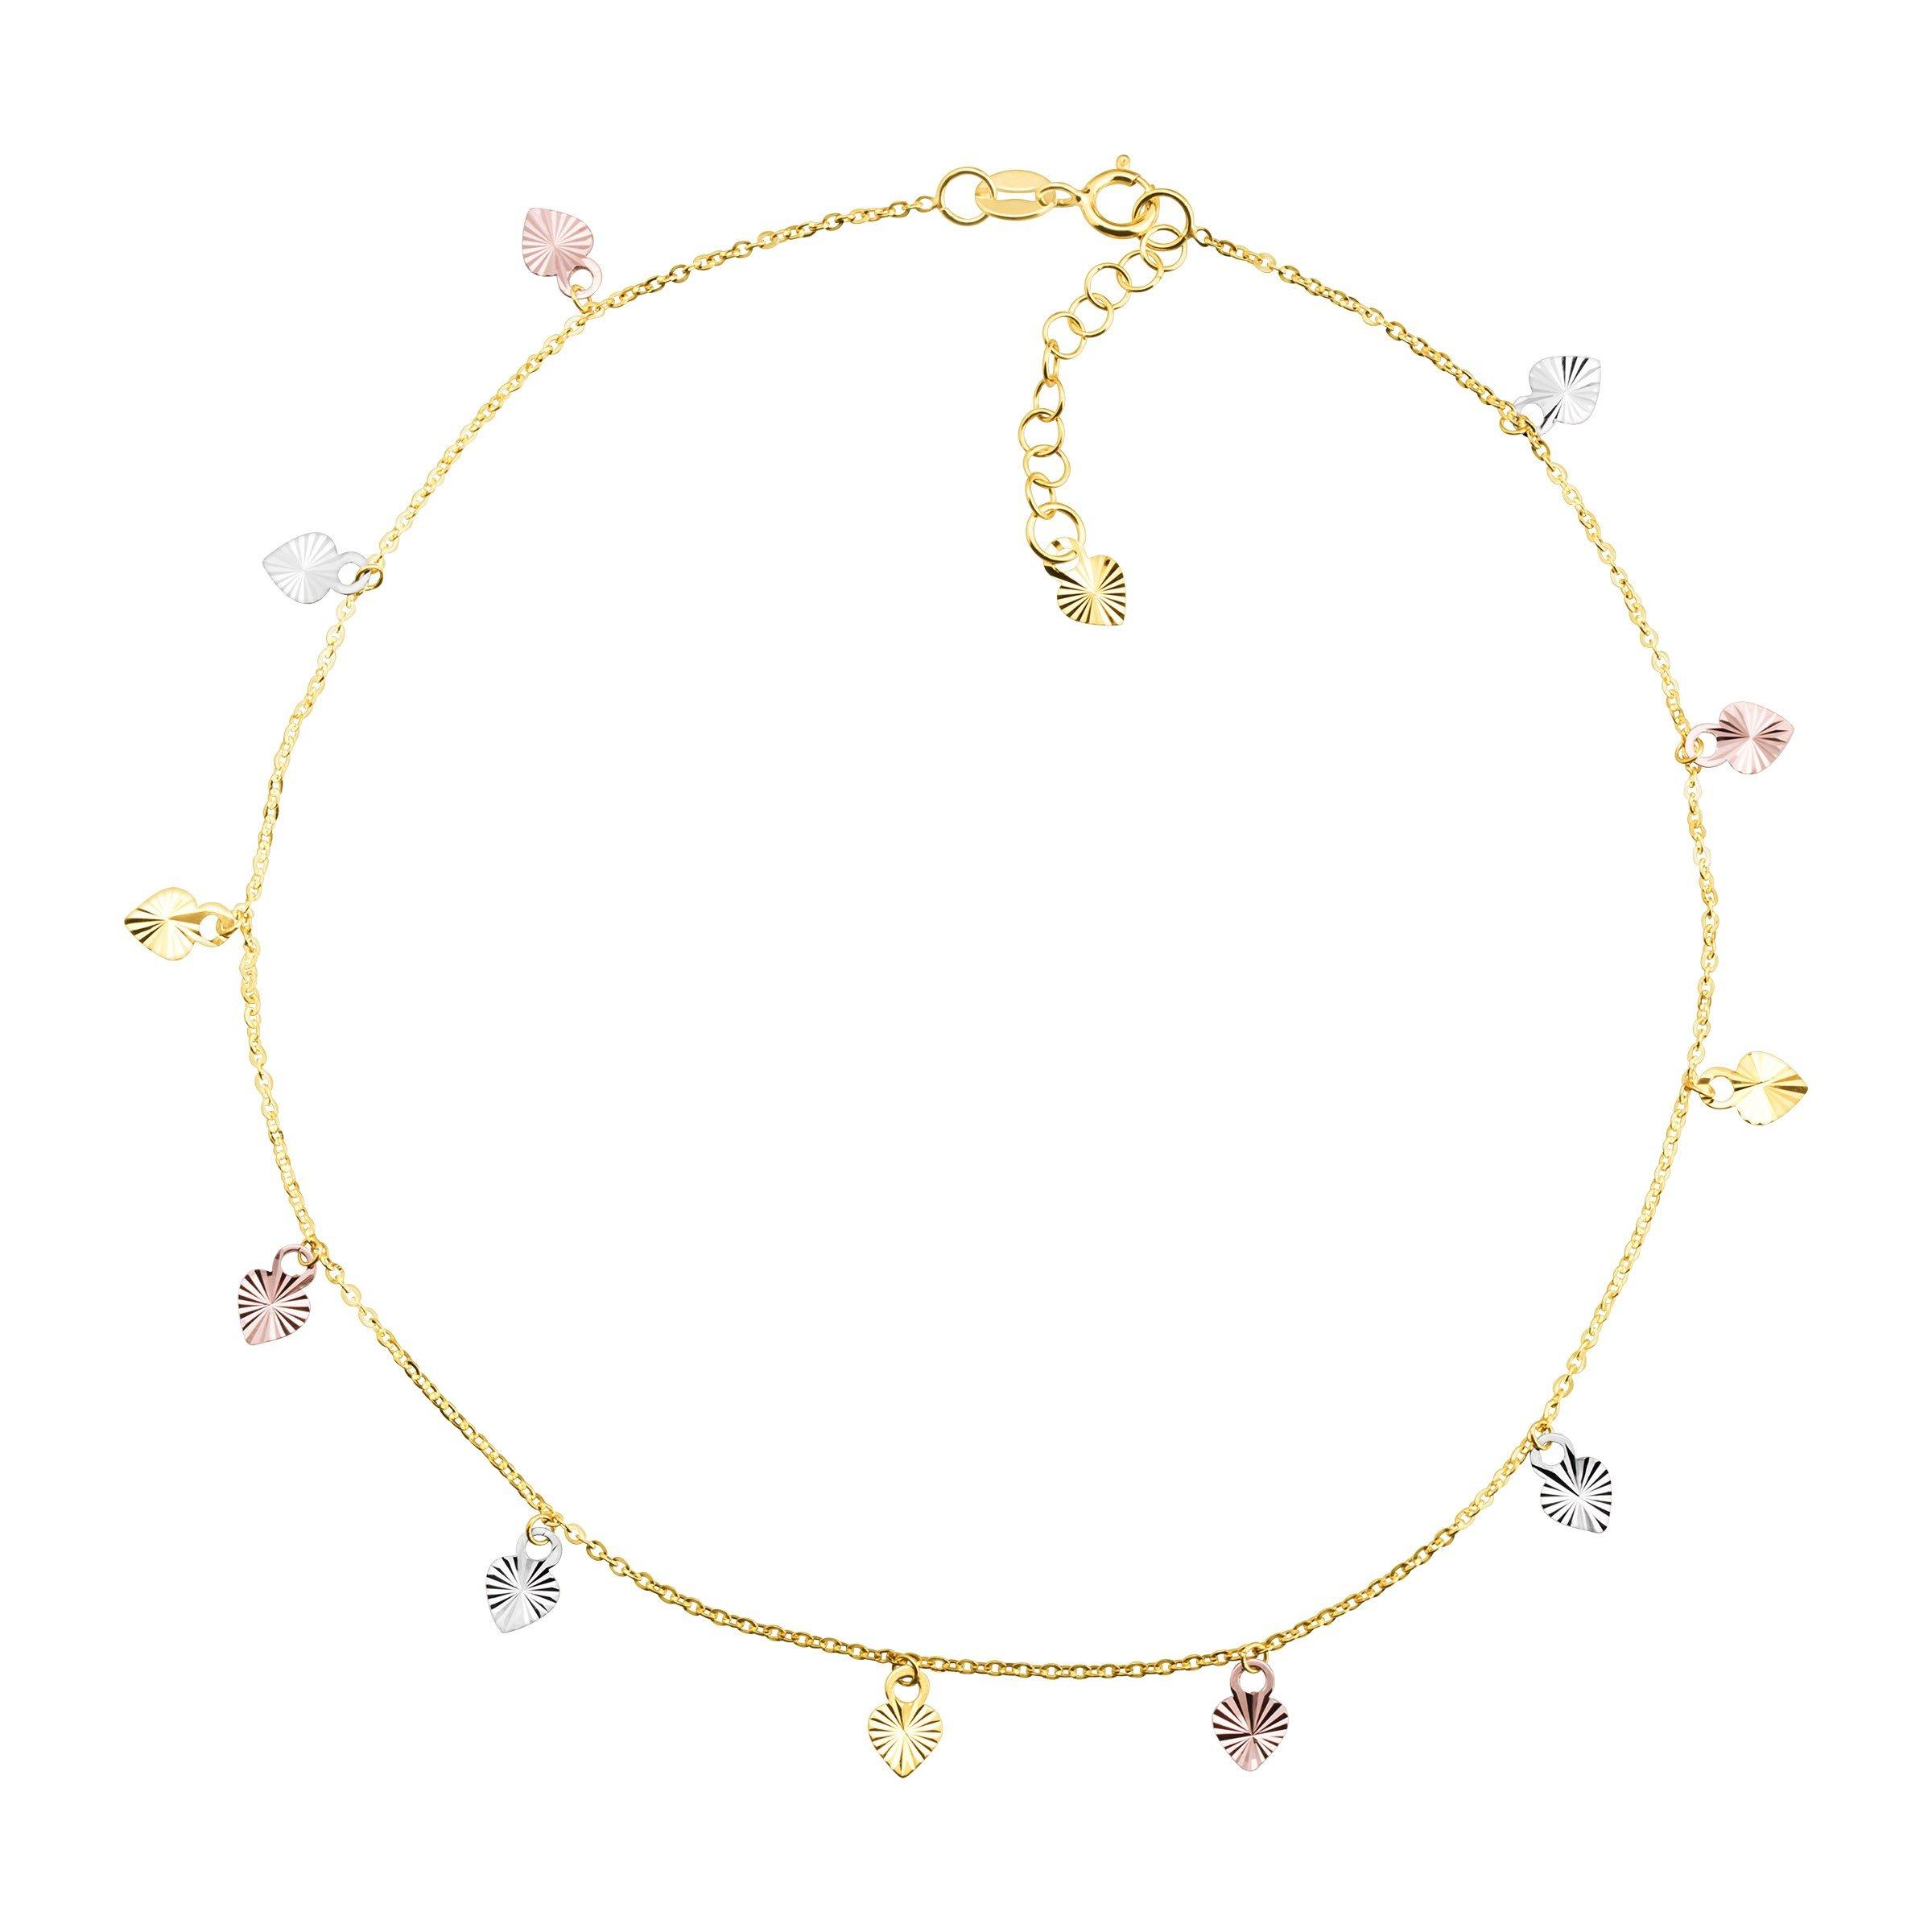 Eternity Gold Heart Charm Anklet Bracelet in 10K Three-Tone Gold